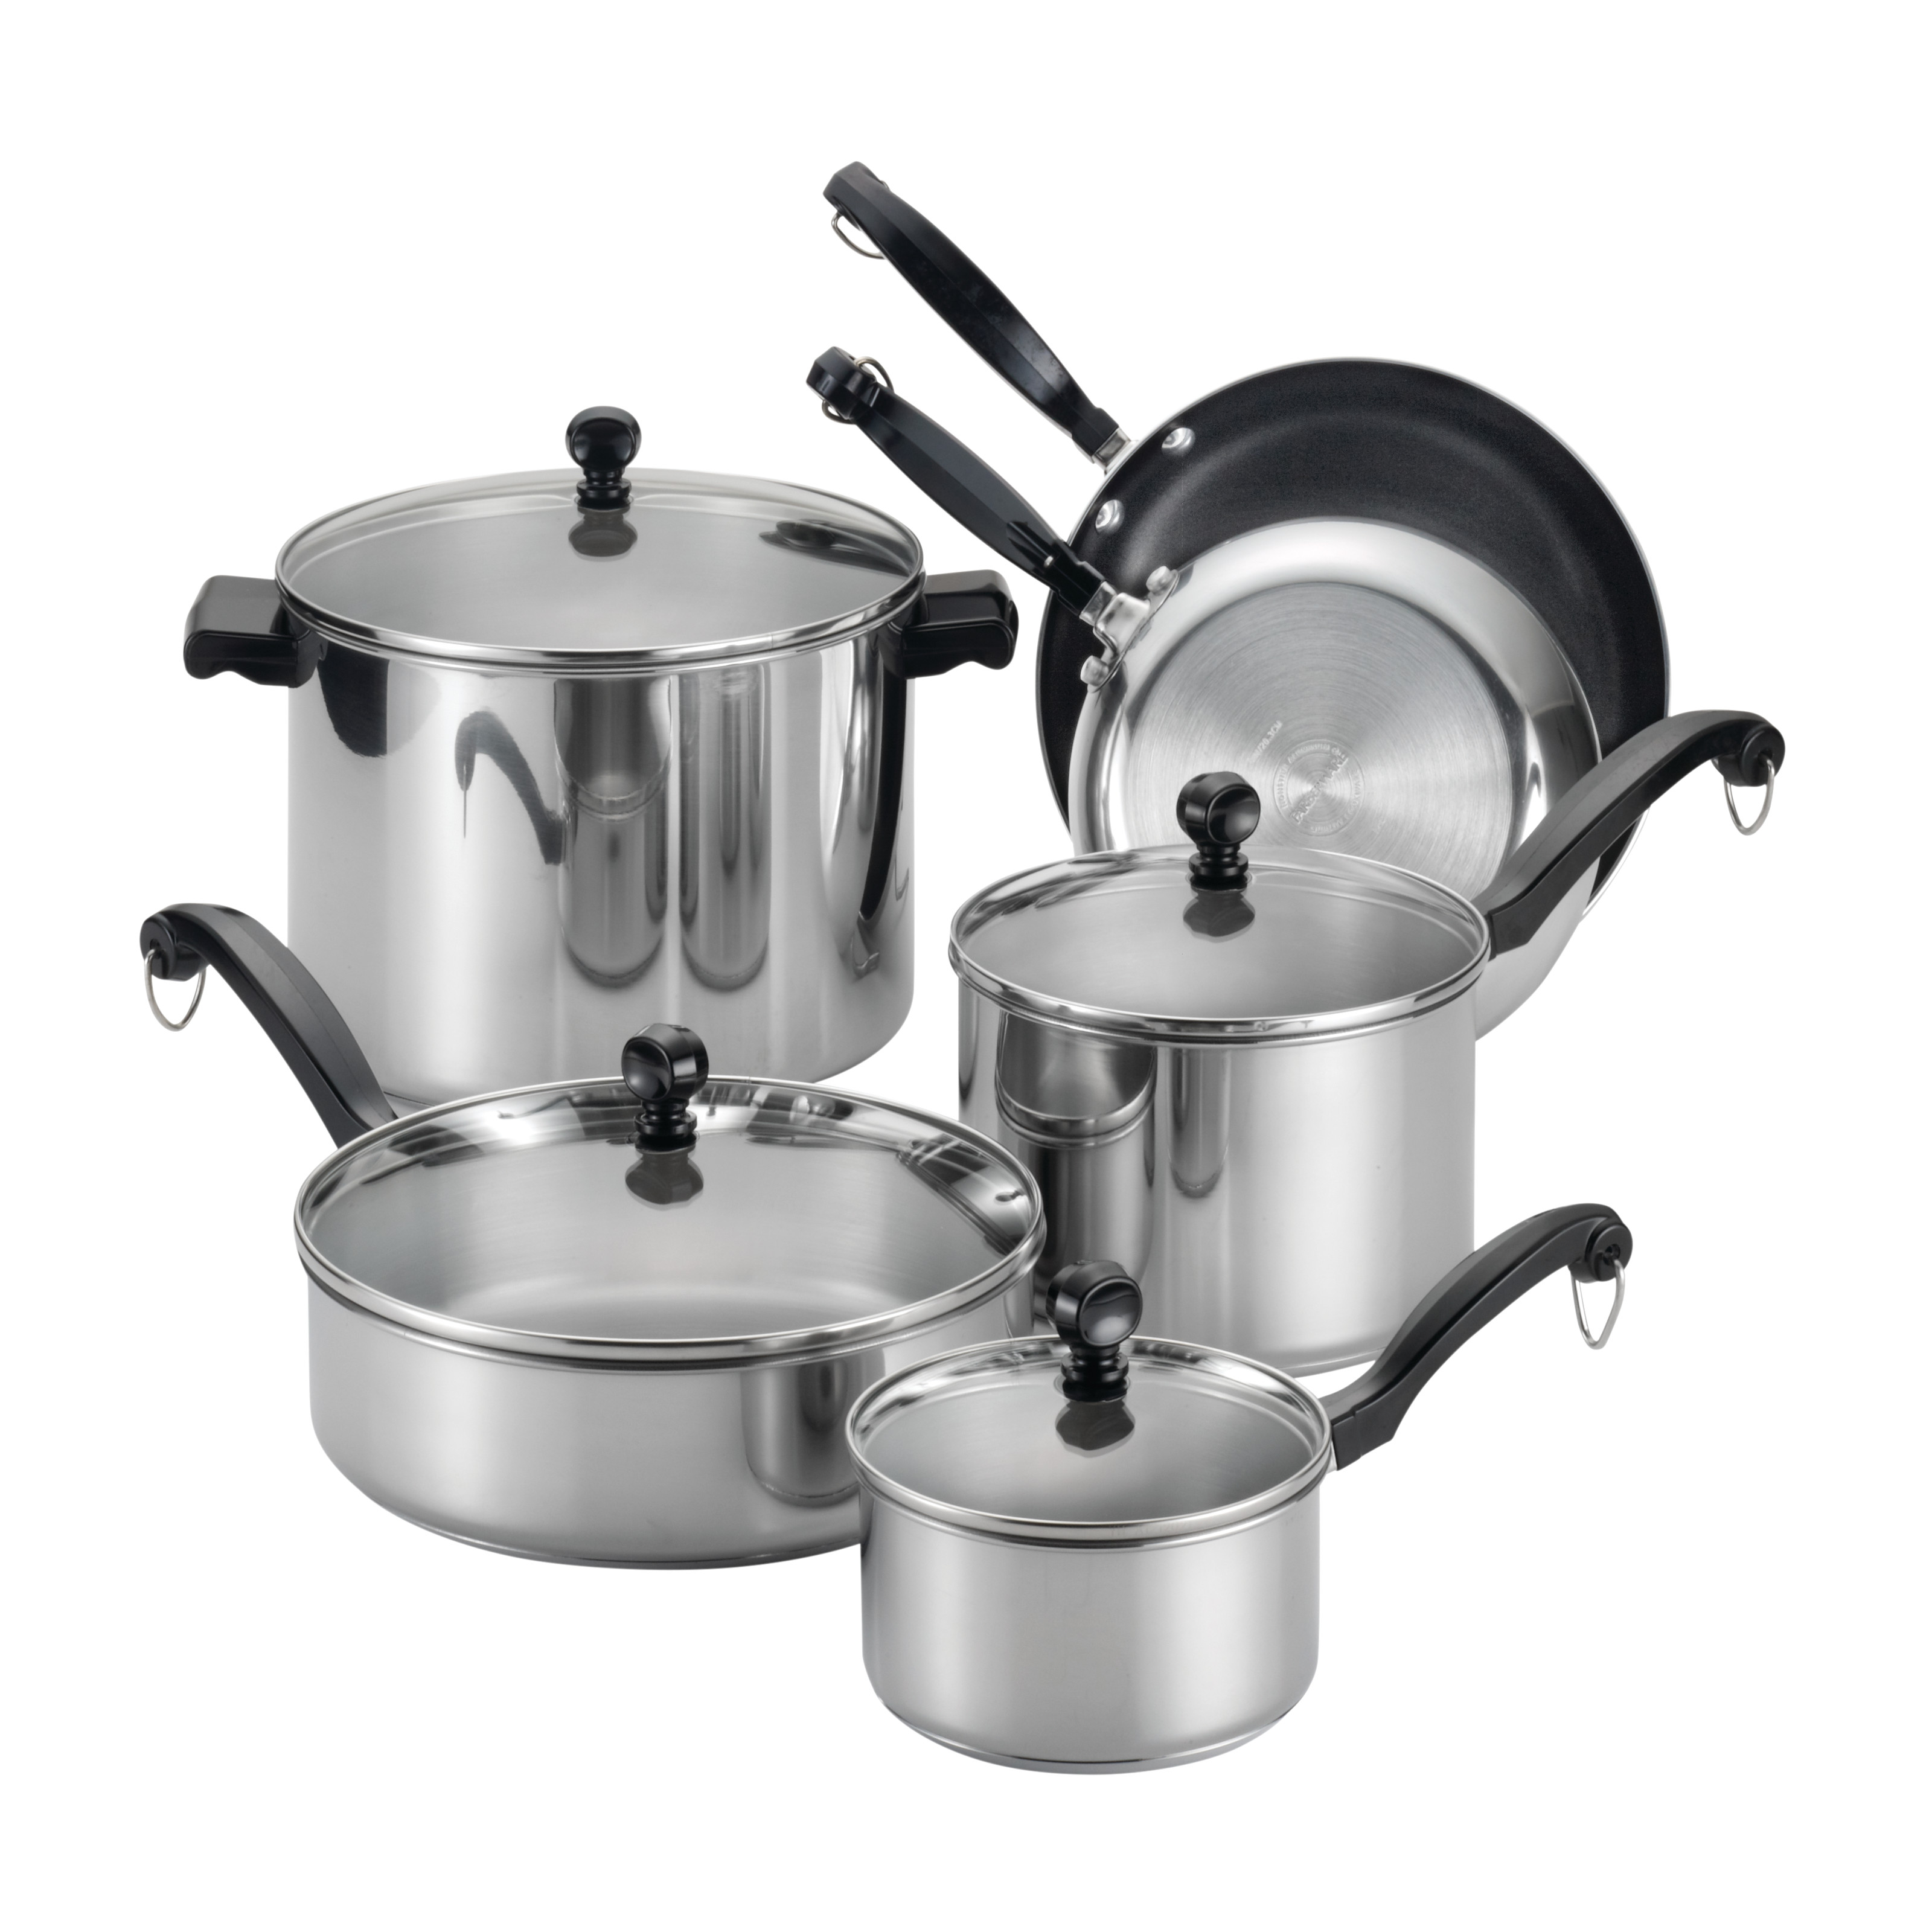 Farberware Classic Series  12-Piece Cookware Set